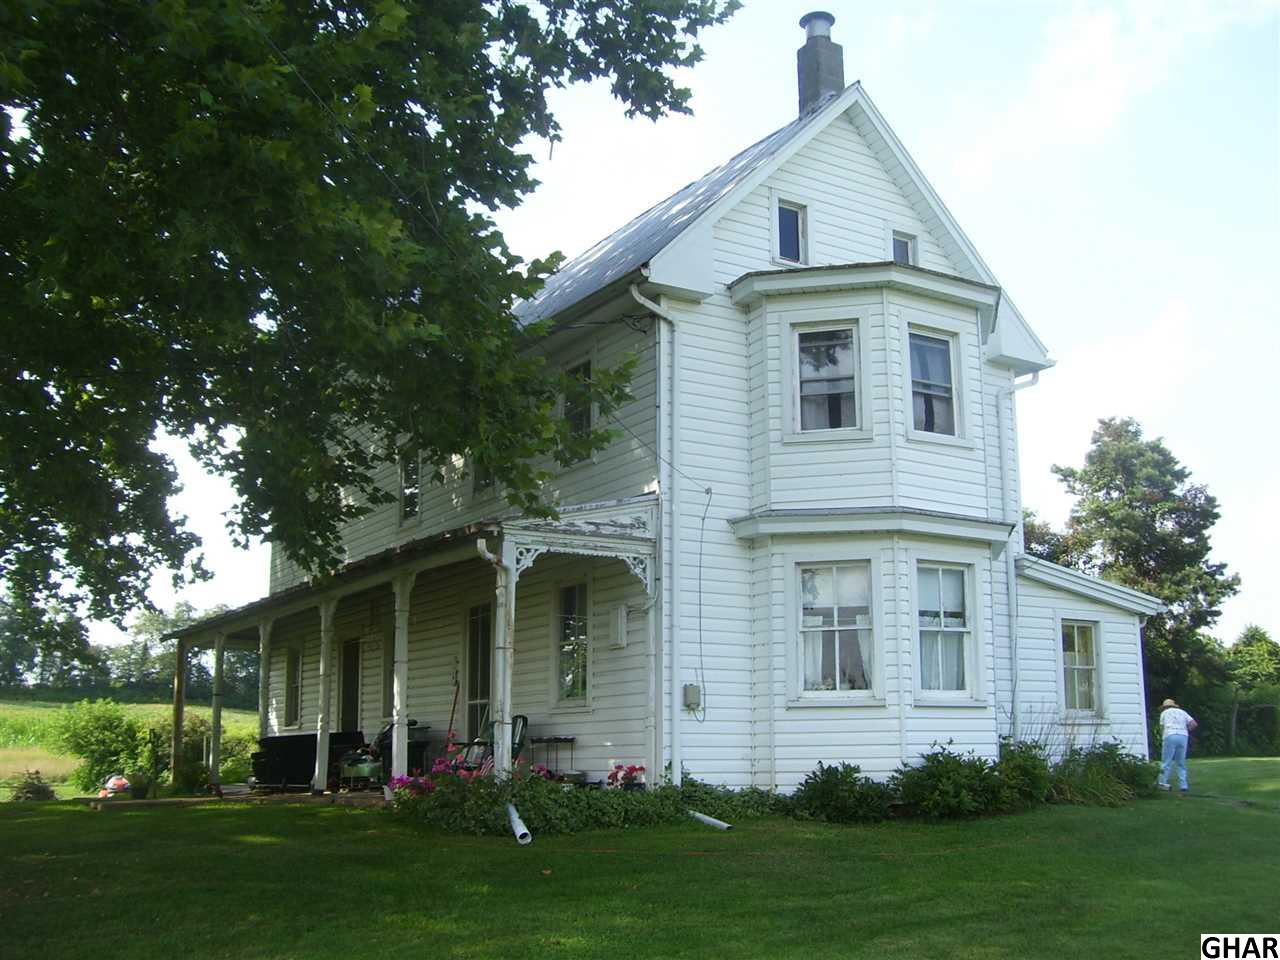 Real Estate for Sale, ListingId: 36315779, York Springs,PA17372